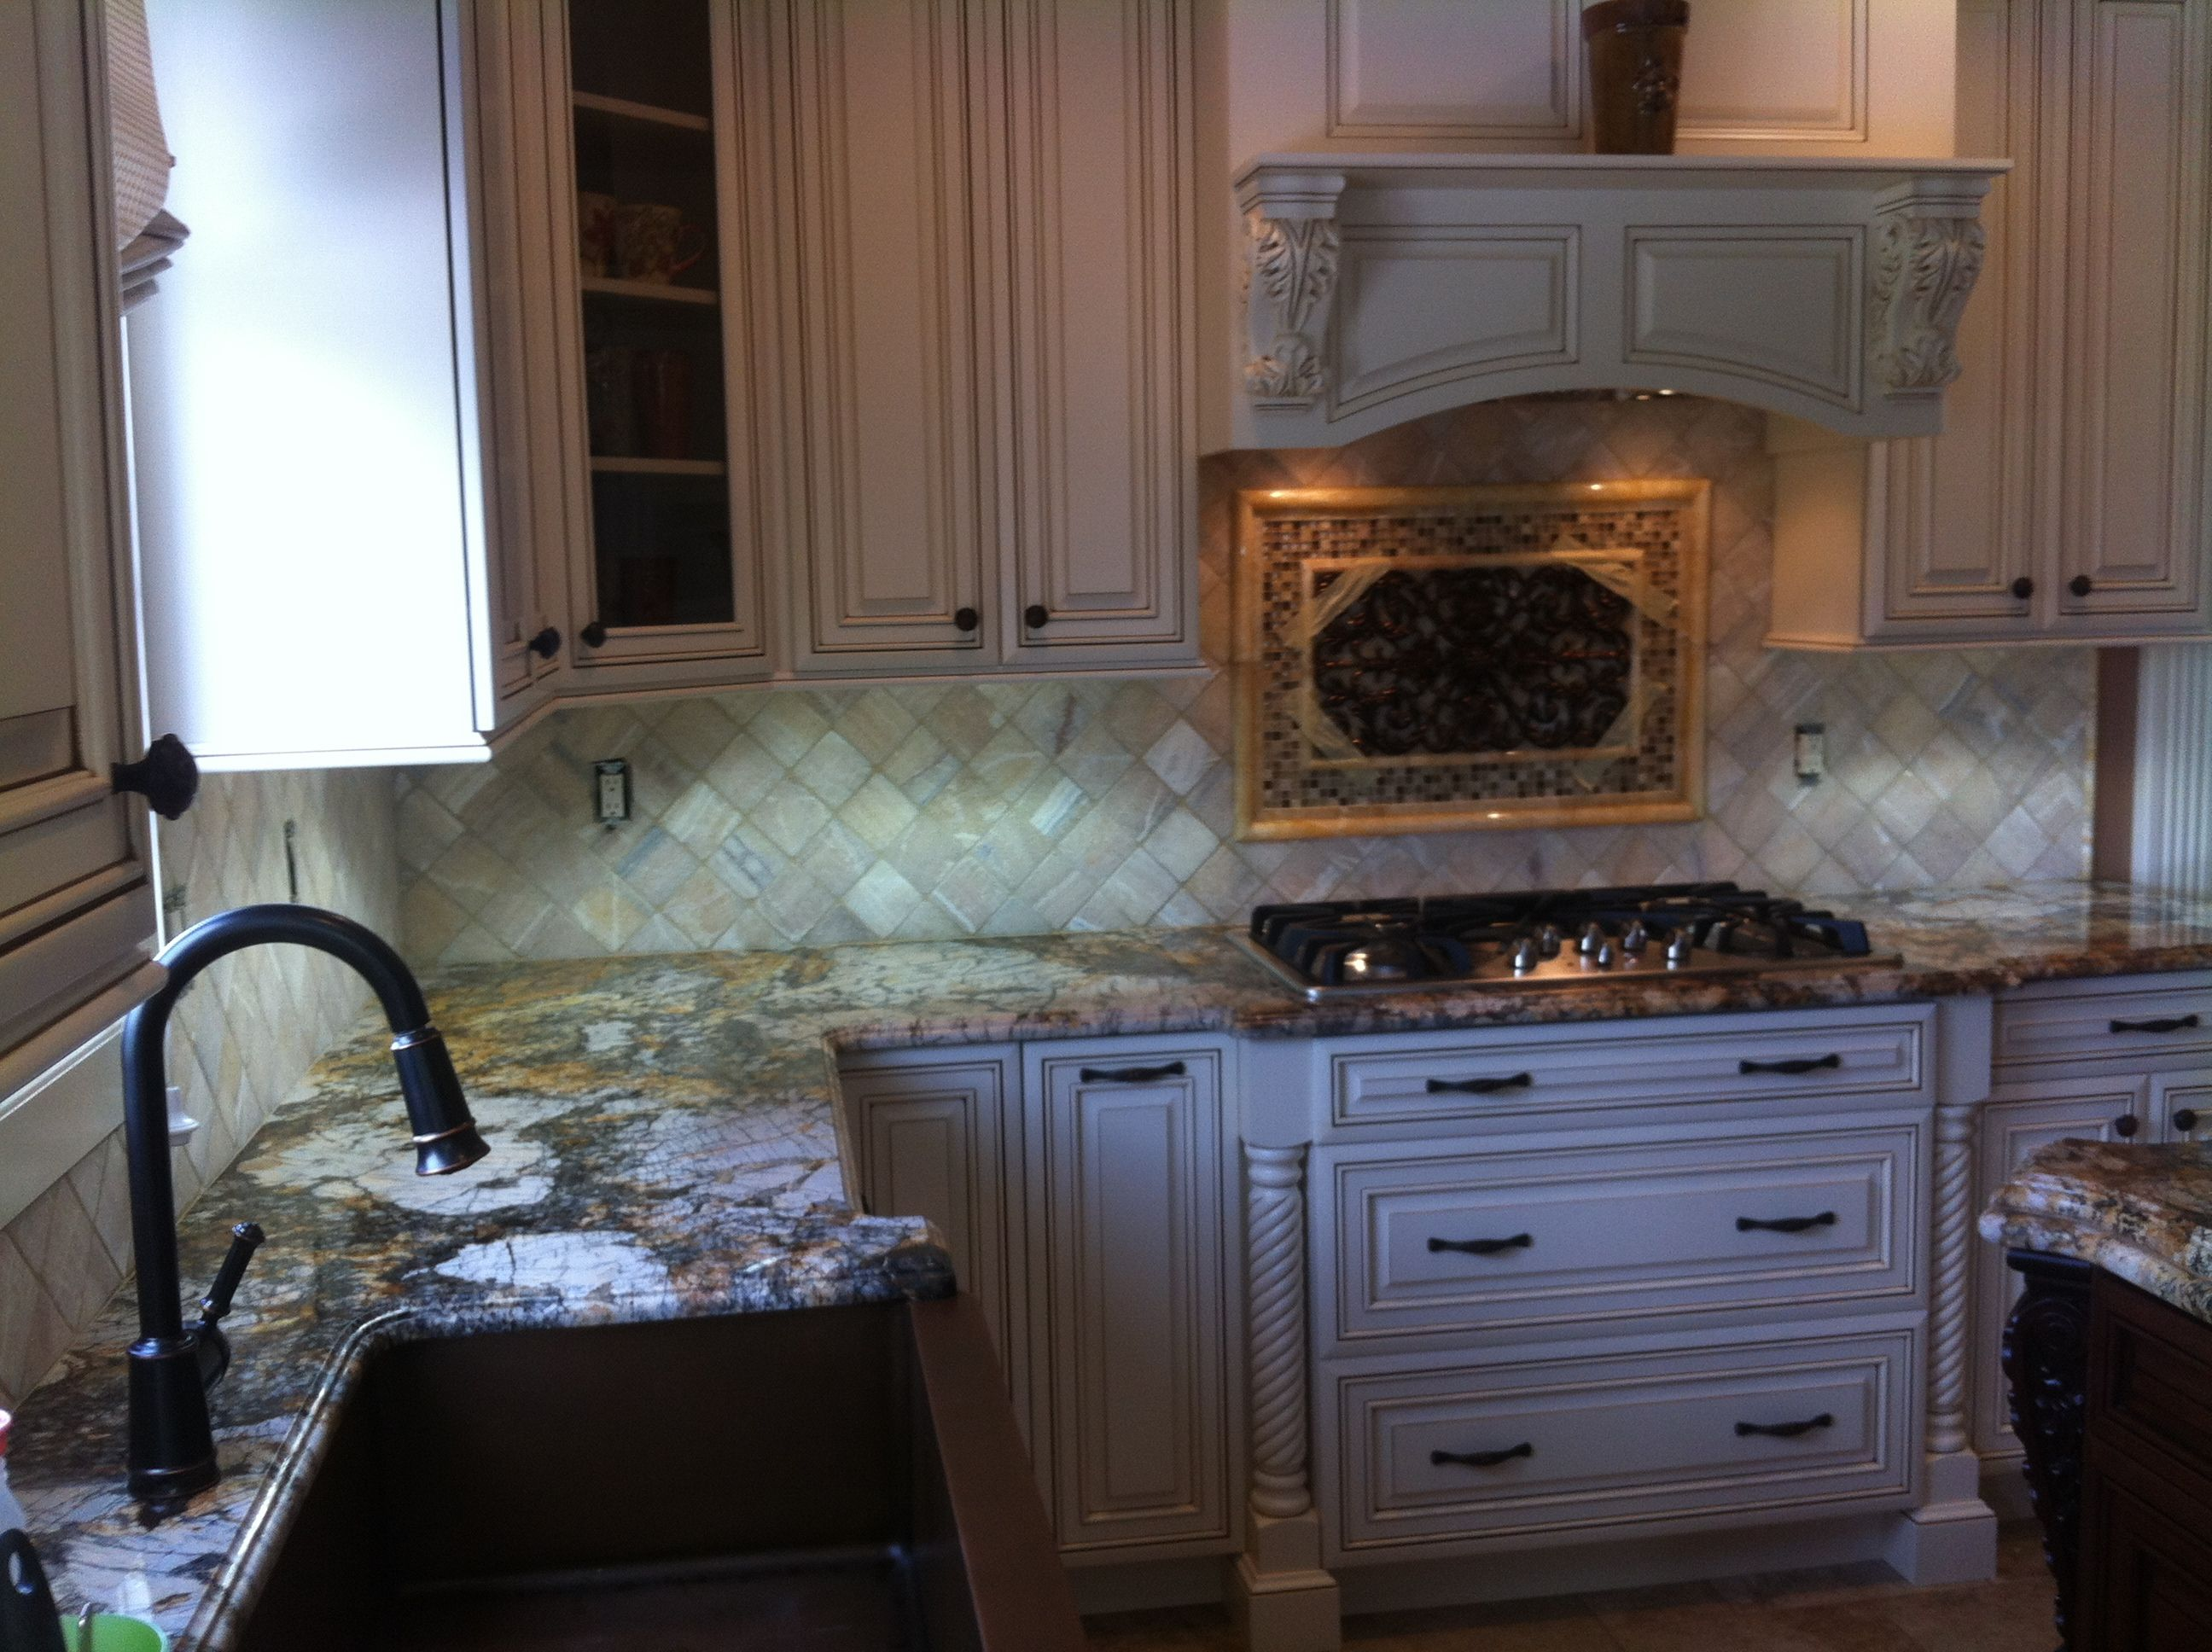 Mascarello Granite Countertops Kitchen Cabinets Staten Island Granite Countertop Granite Countertops Kitchen Granite Kitchen Kitchen Cabinets